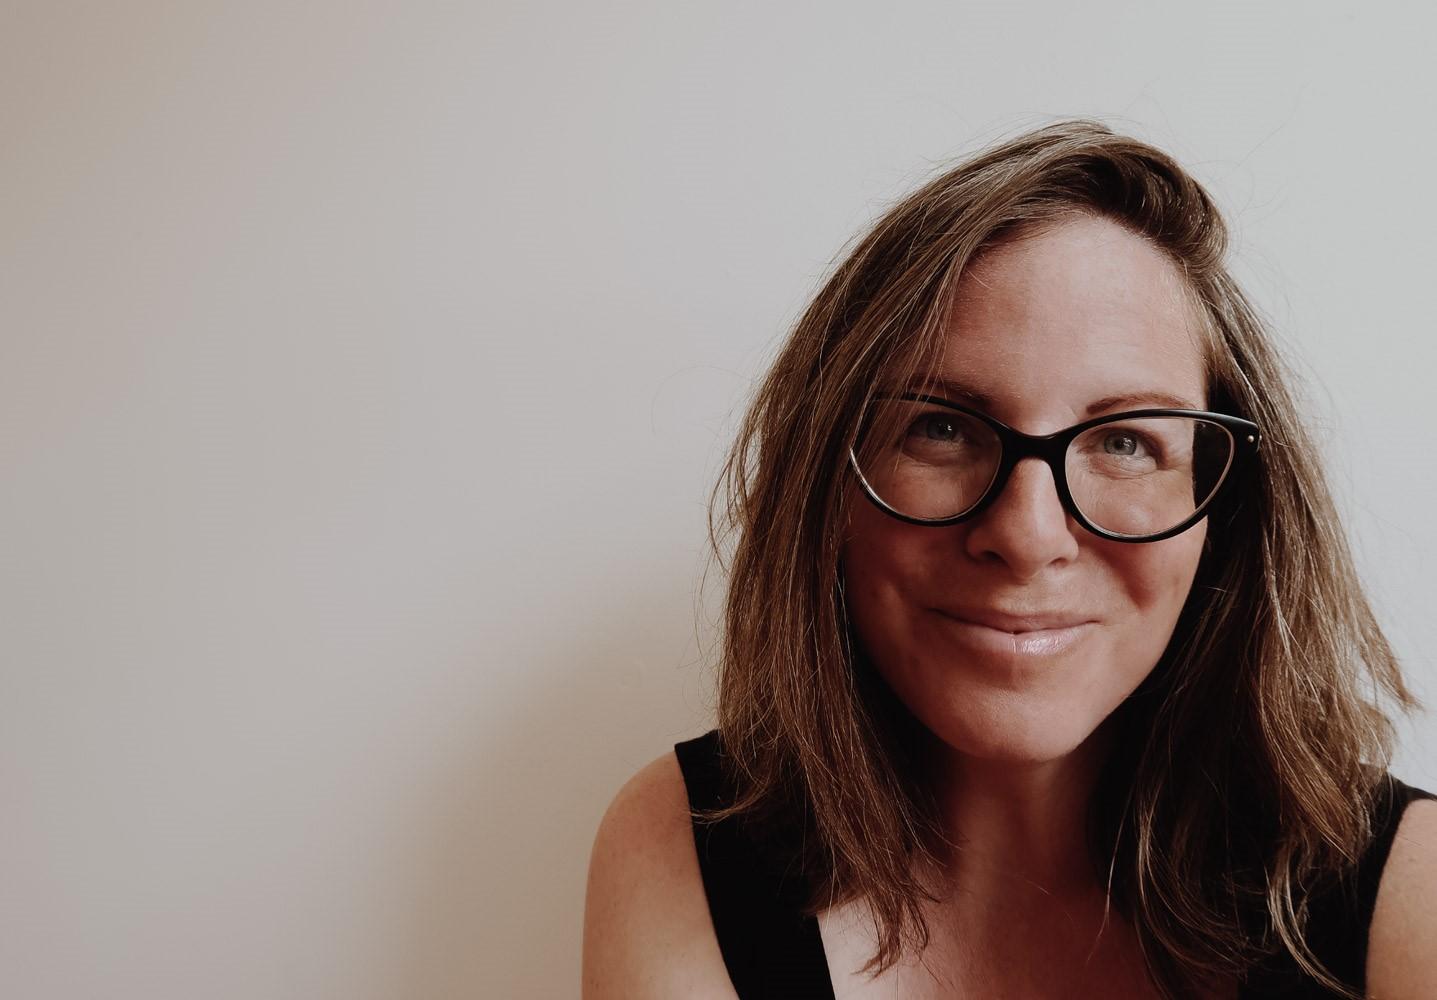 Beth Henson | @somedayslower